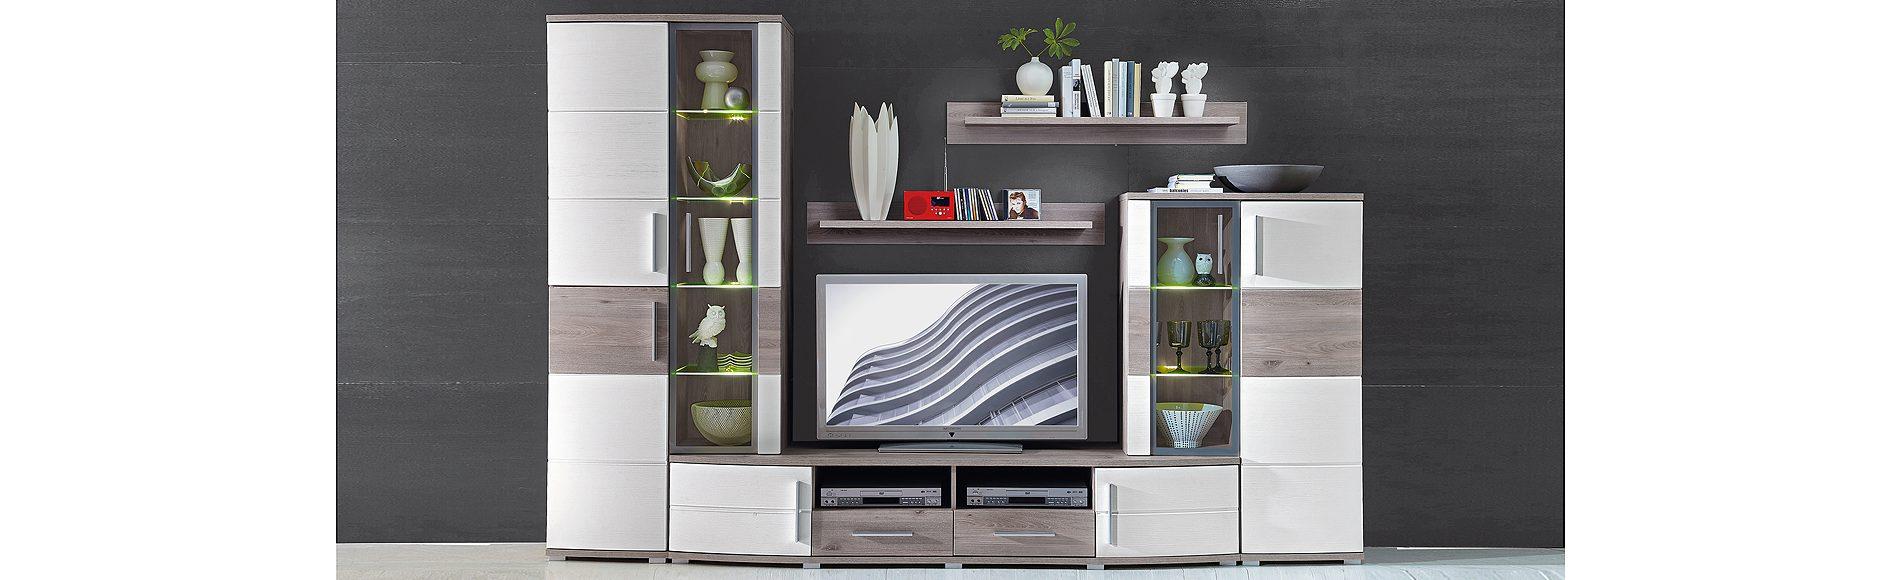 wohnw nde robin hood m bel k chen g nstig kaufen. Black Bedroom Furniture Sets. Home Design Ideas